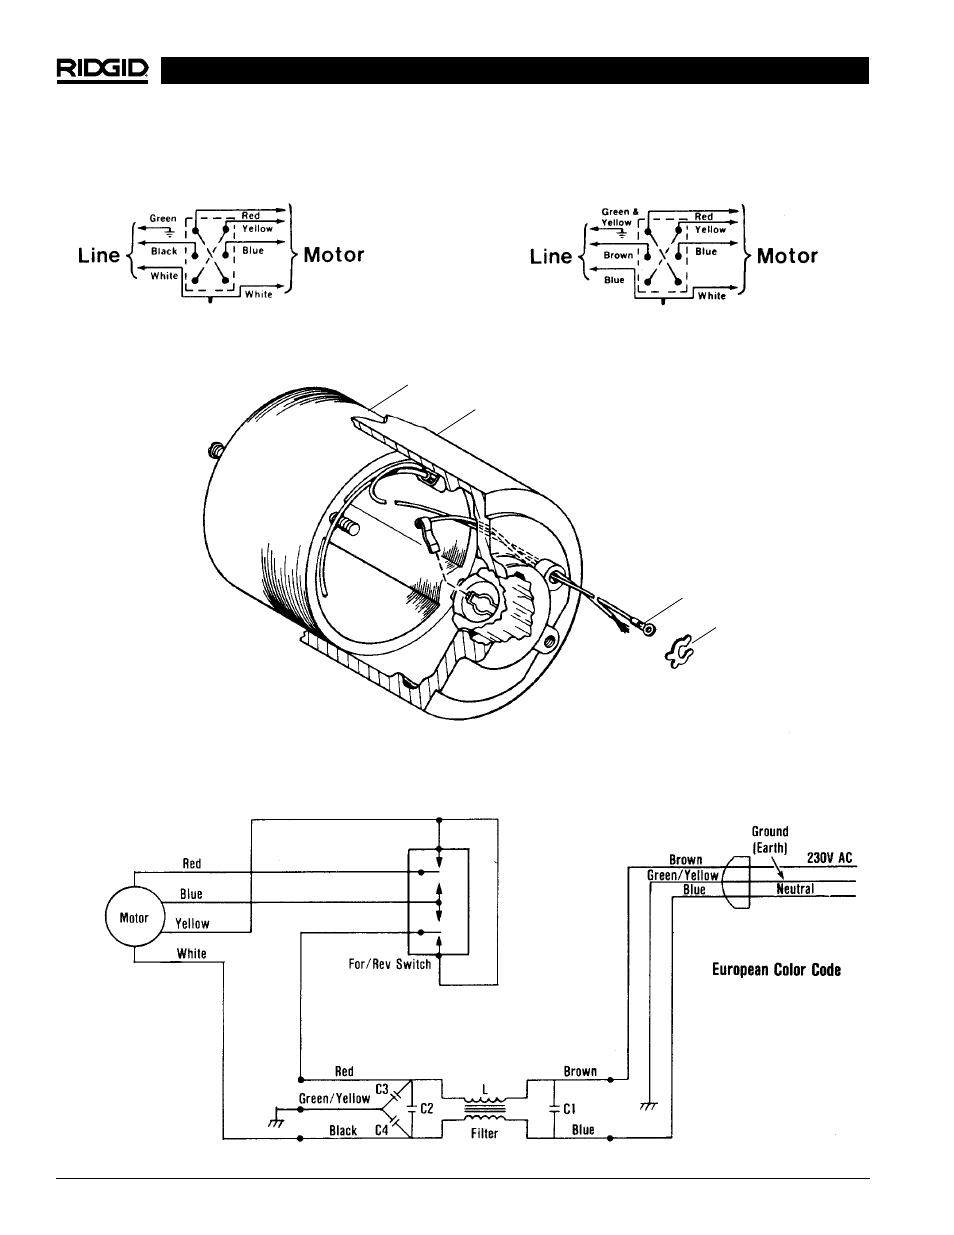 medium resolution of ridgid 4 wire 220v plug wiring diagram